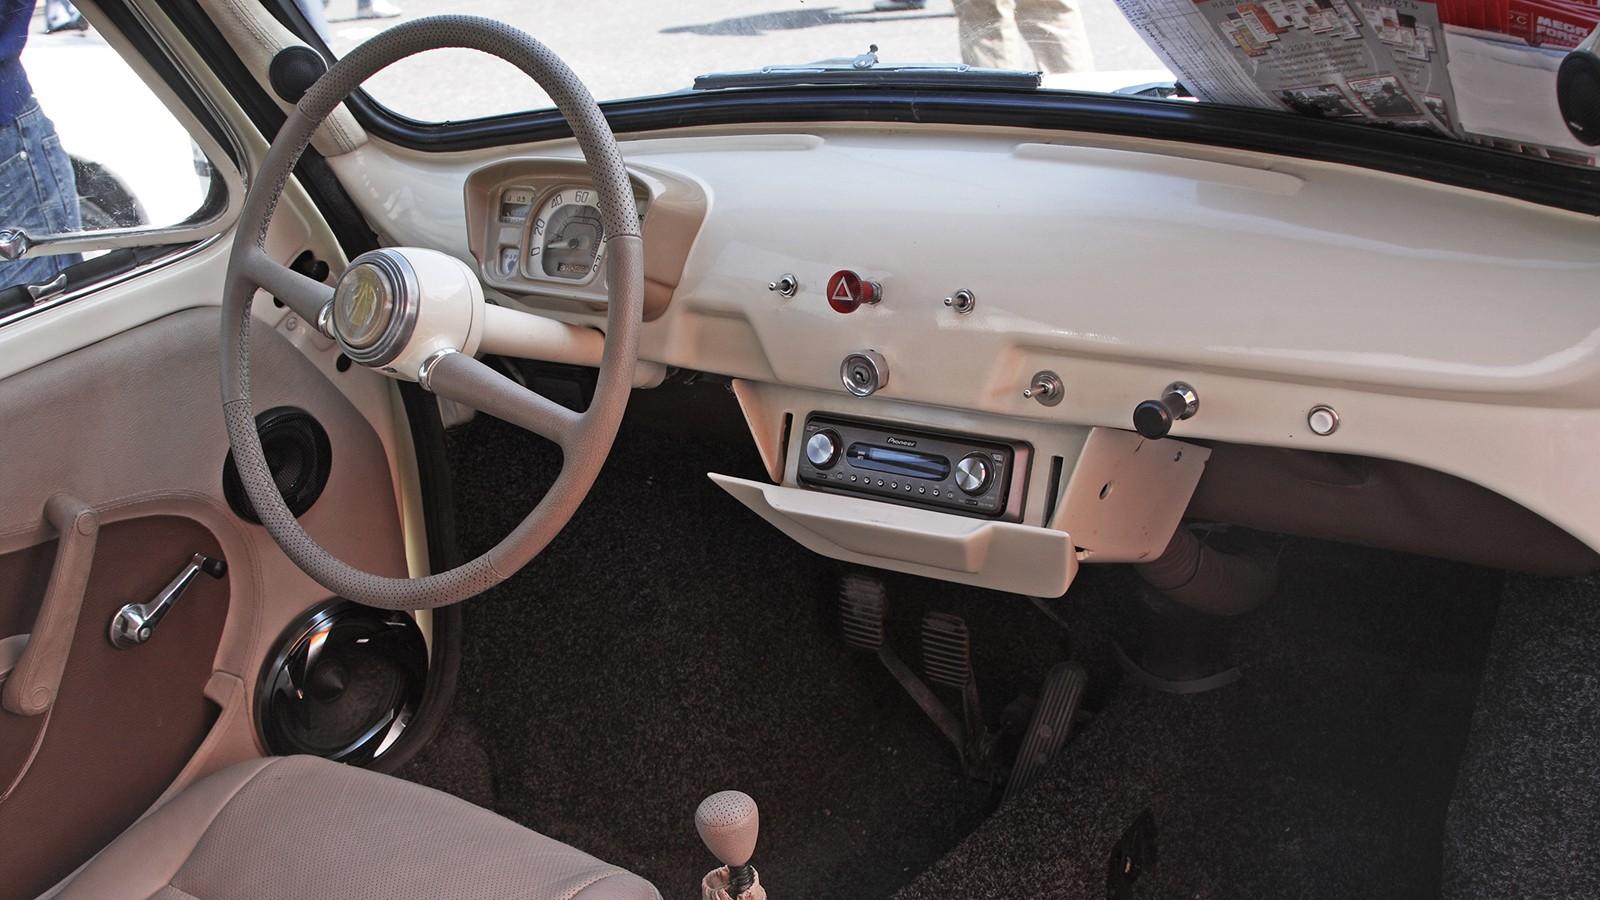 Салон этого ЗАЗ-965 подвергнут легкому тюнингу